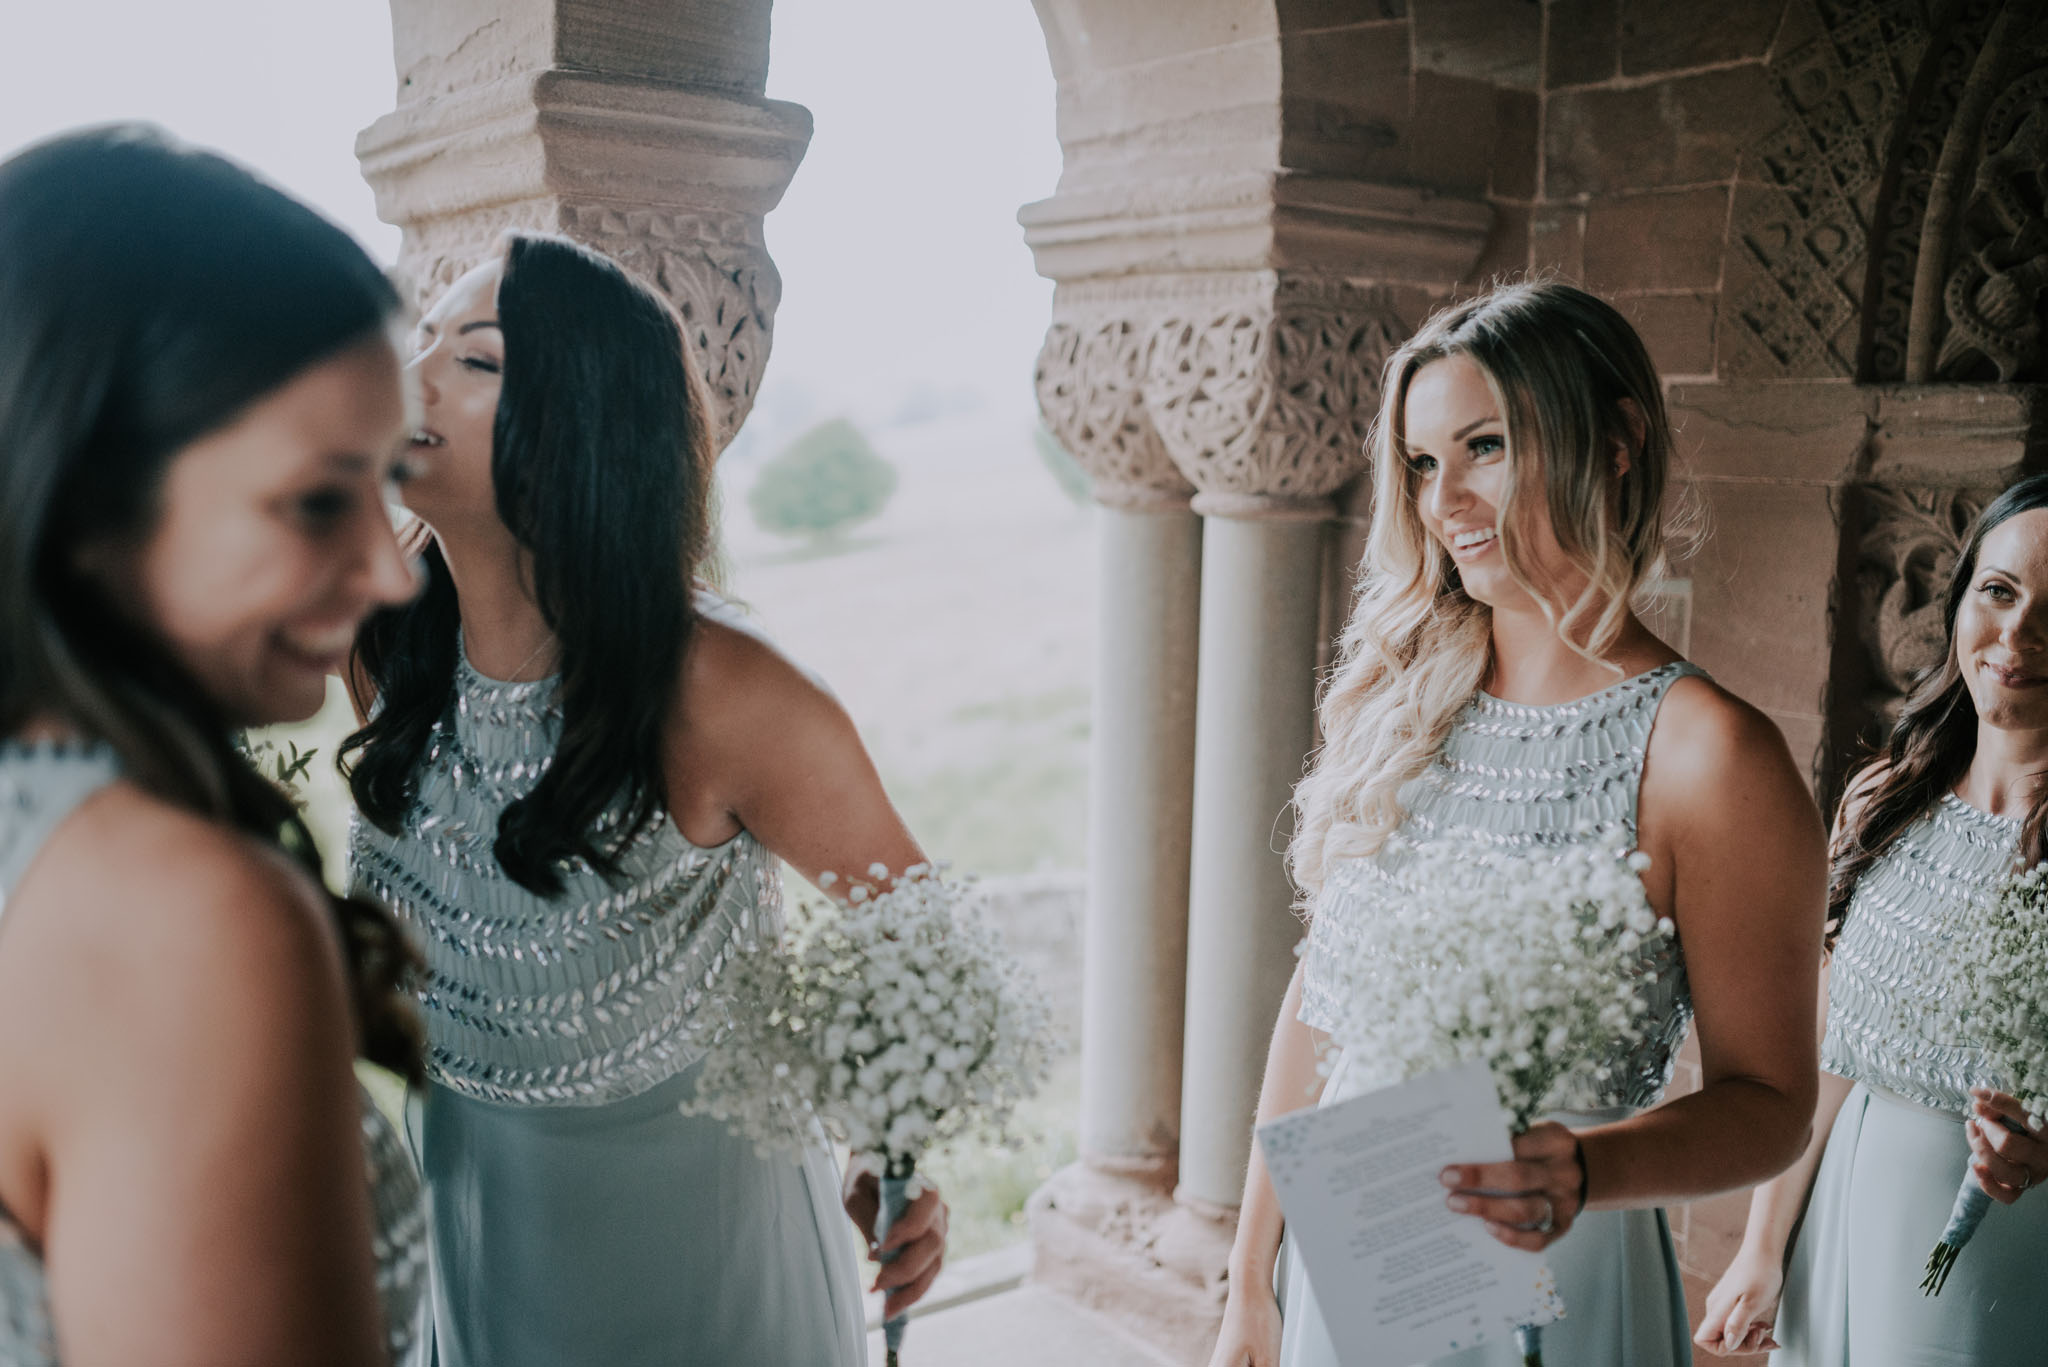 wedding-photographer-glewstone-court-hereford-scott-stockwell-photography231.jpg